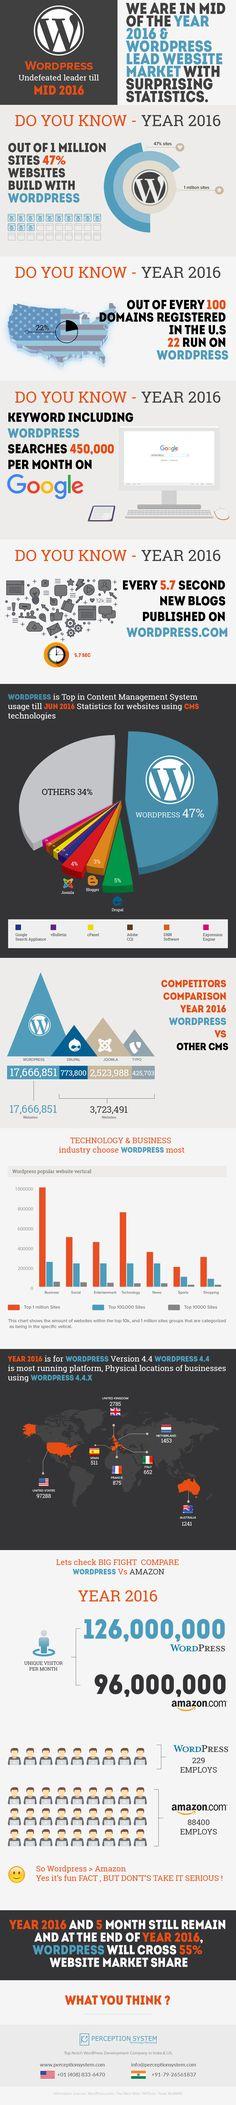 Popularity of Wordpress CMS in 2016 with Surprising Statistics #Infographic #WordPress